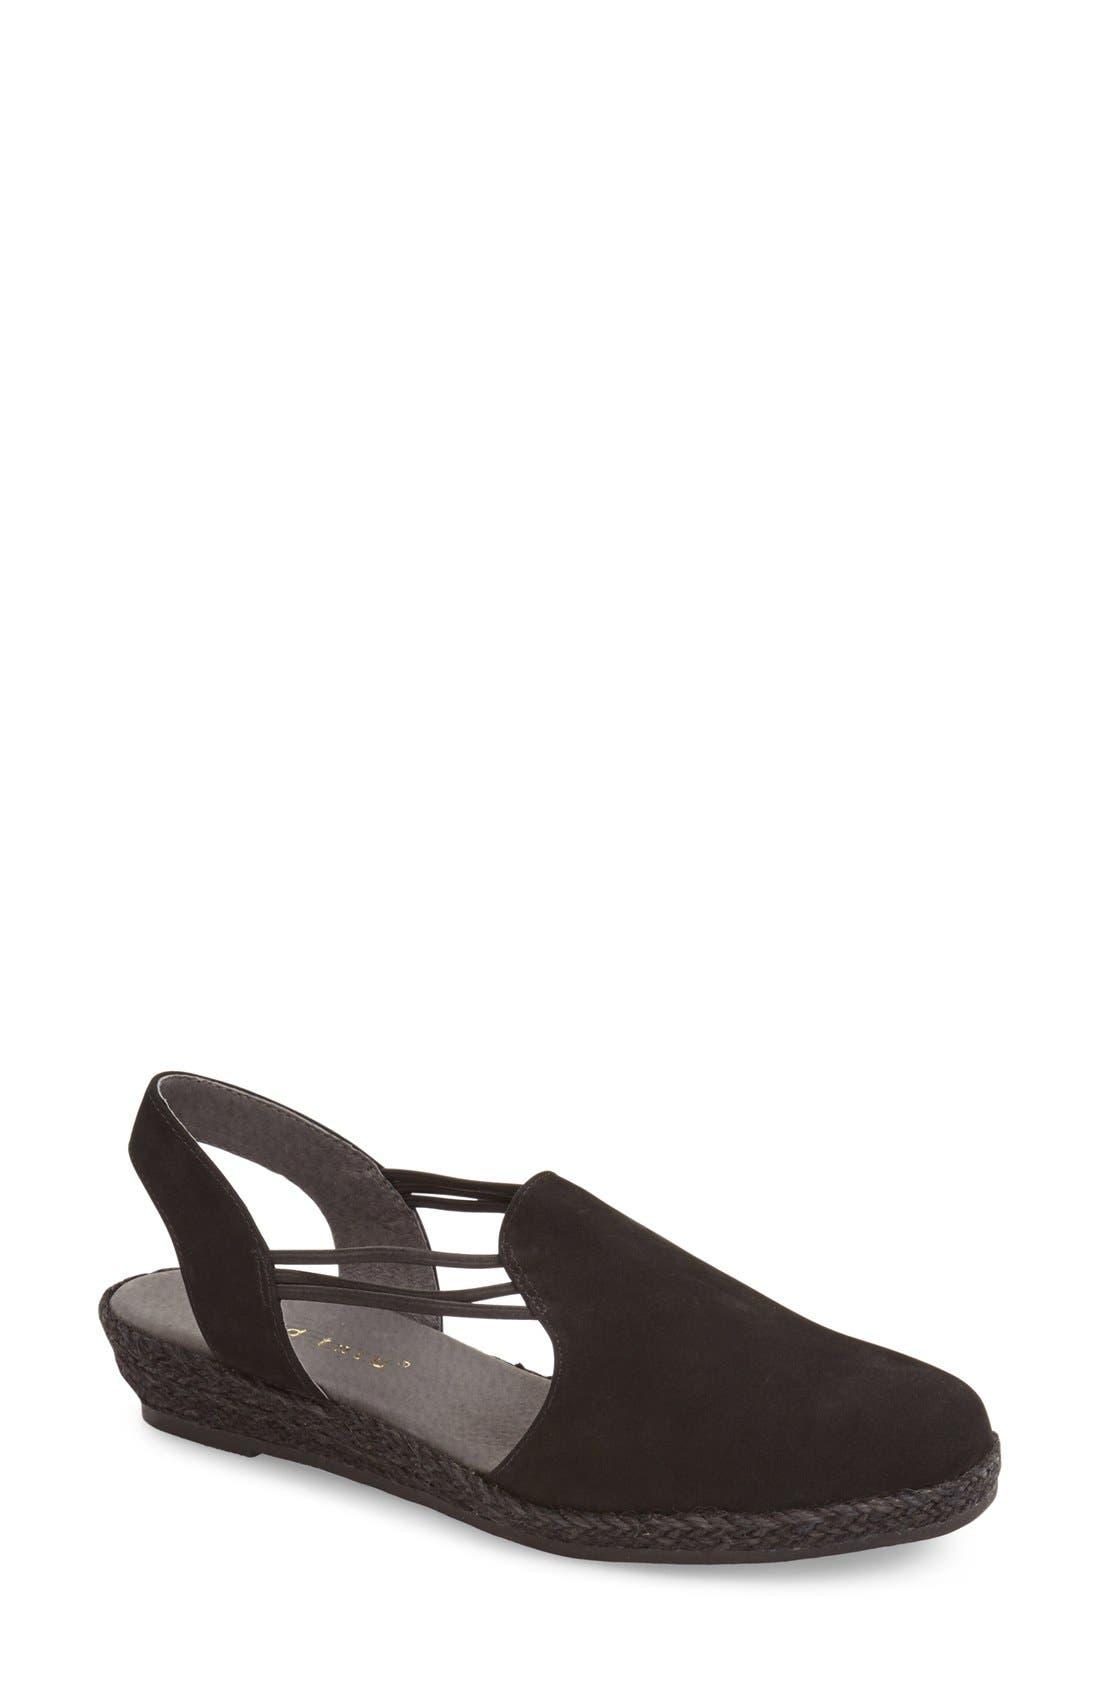 'Nelly' Slingback Wedge Sandal,                         Main,                         color, BLACK NUBUCK